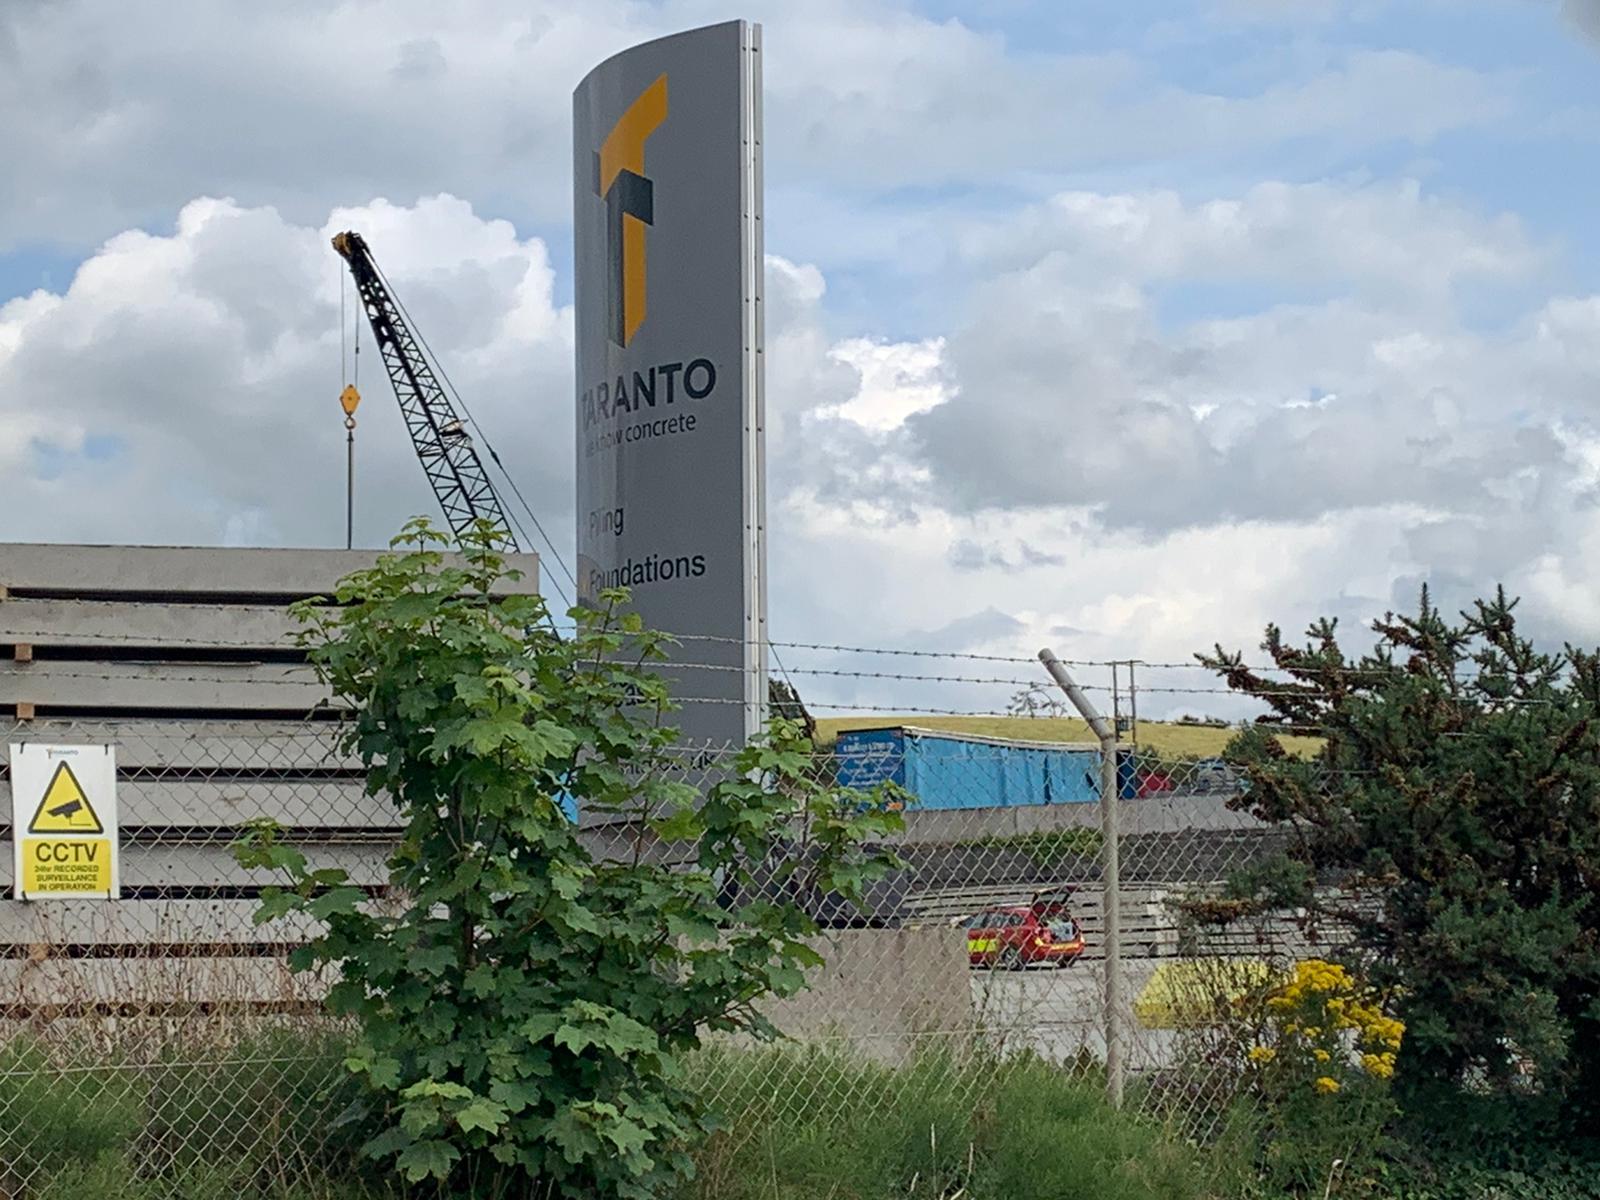 Taranto concrete factory in Tandragee